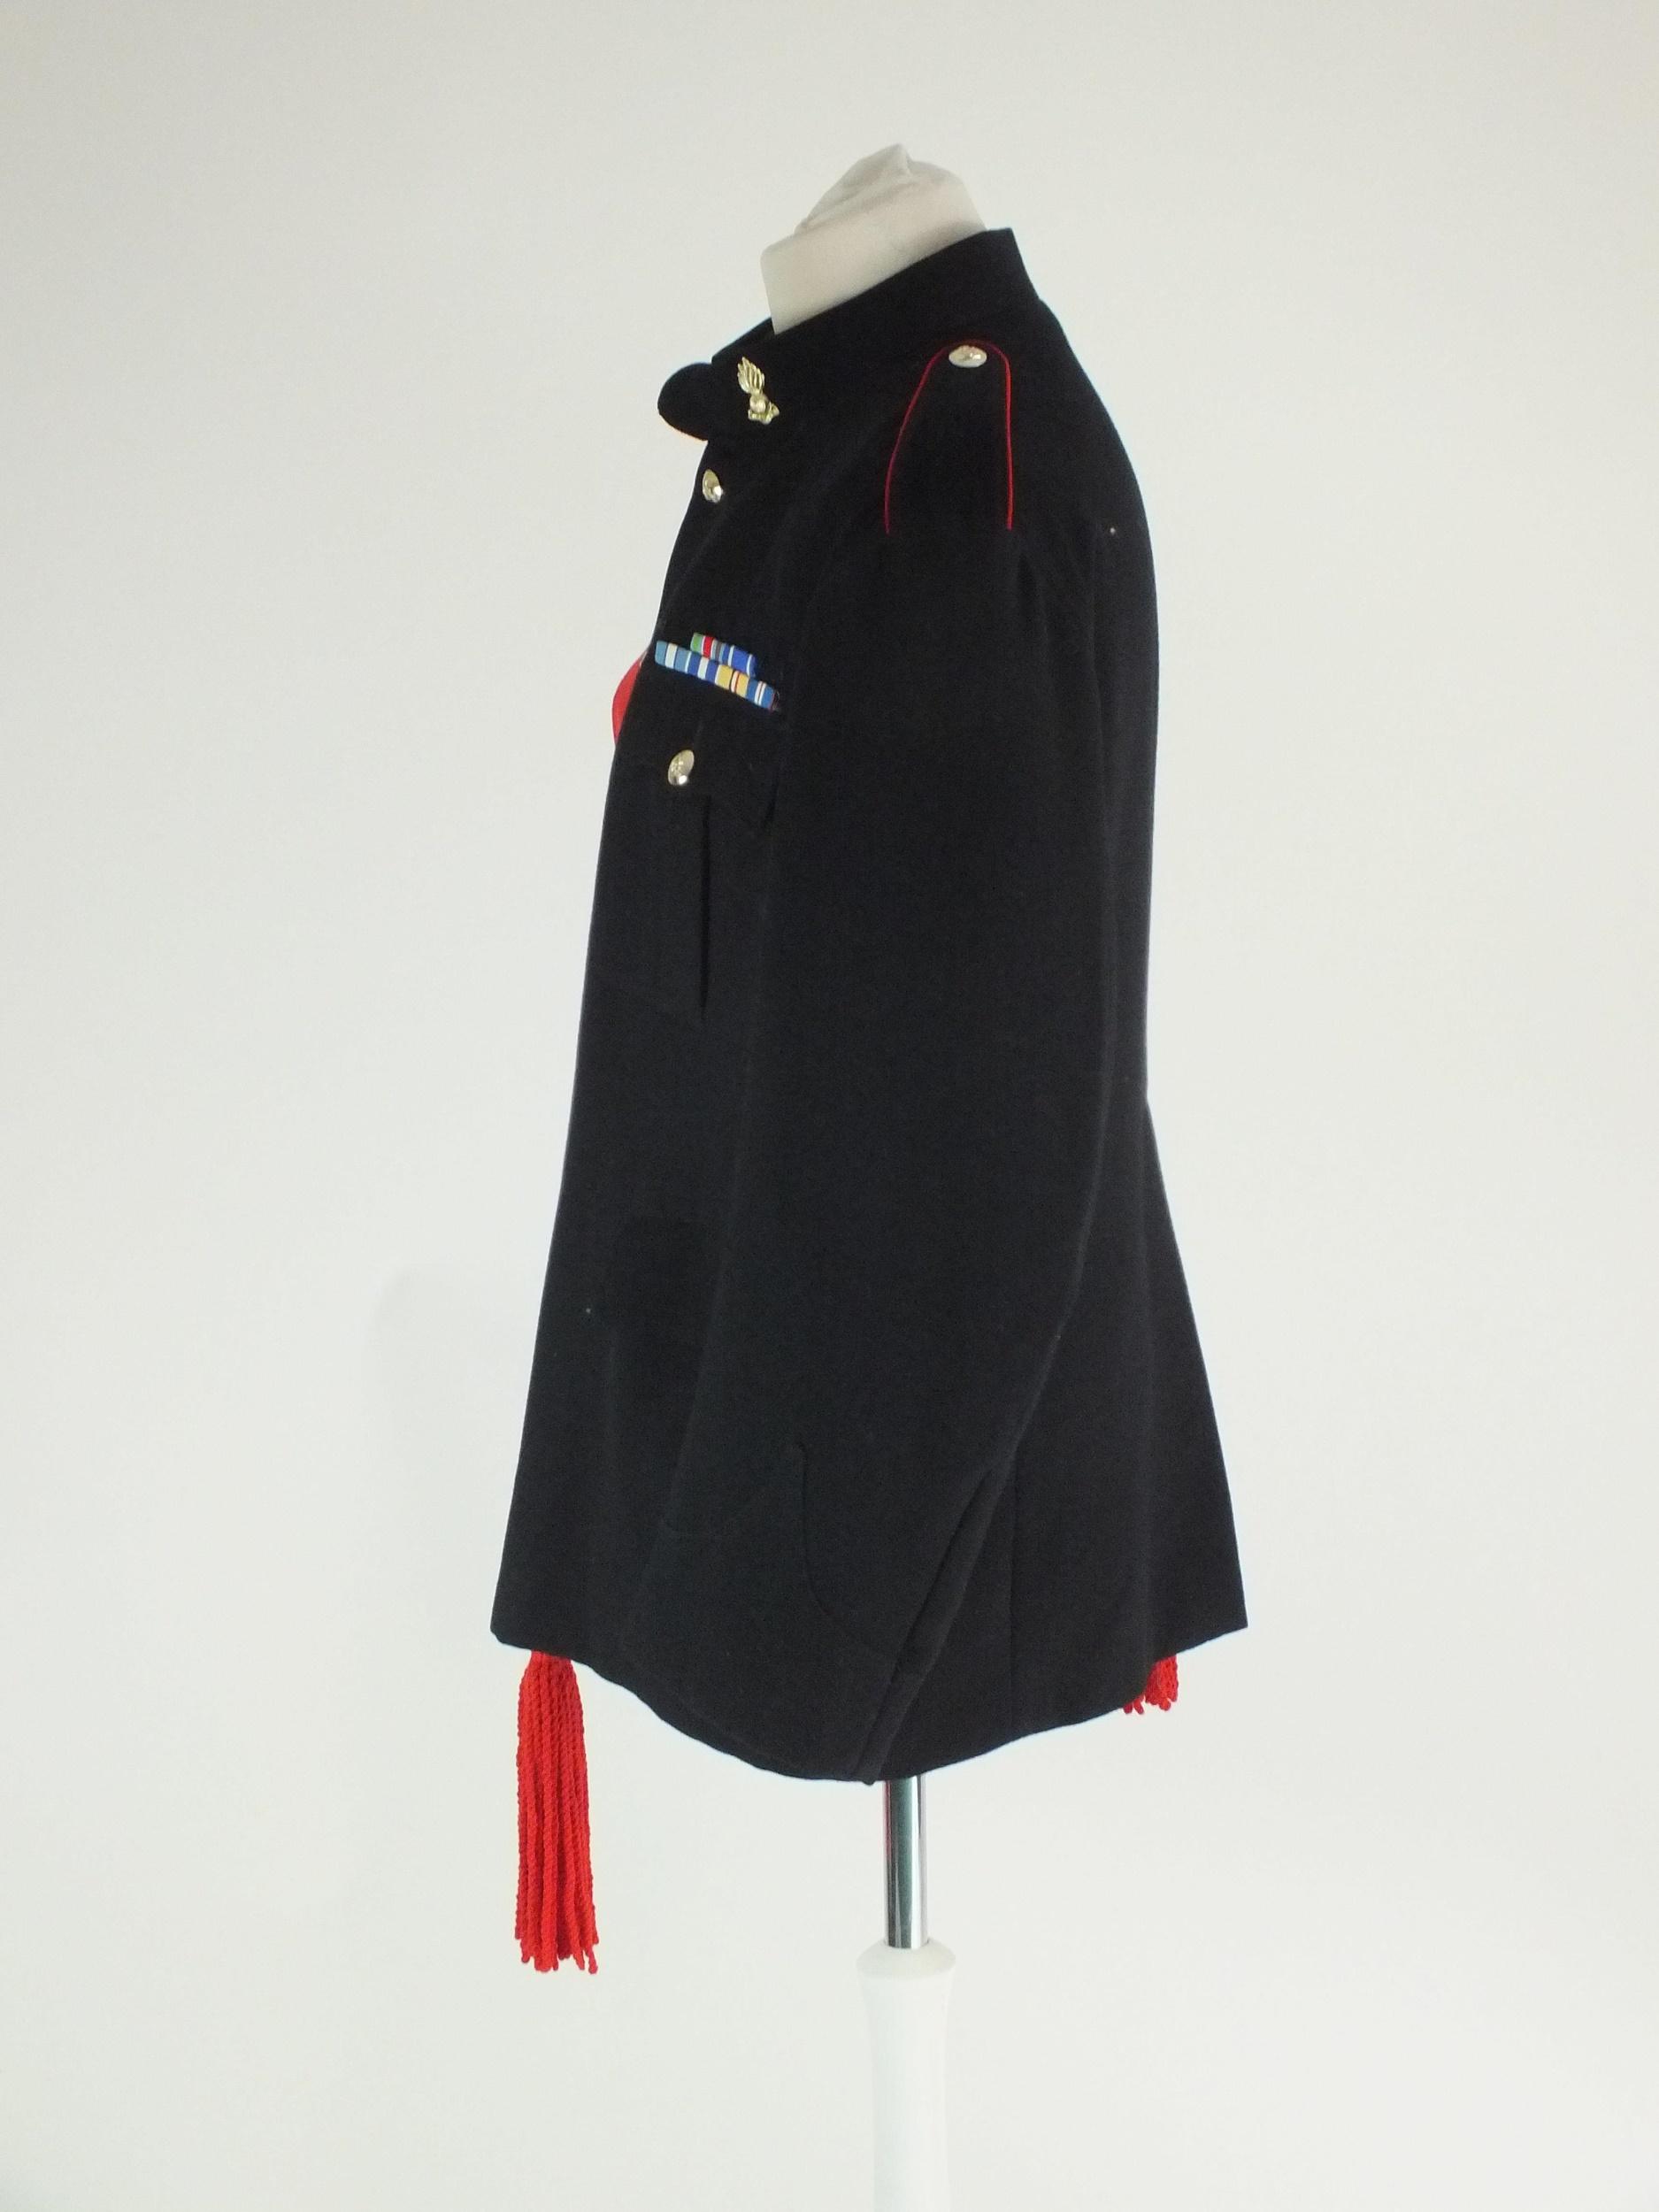 Royal Artillery uniform - Image 7 of 7